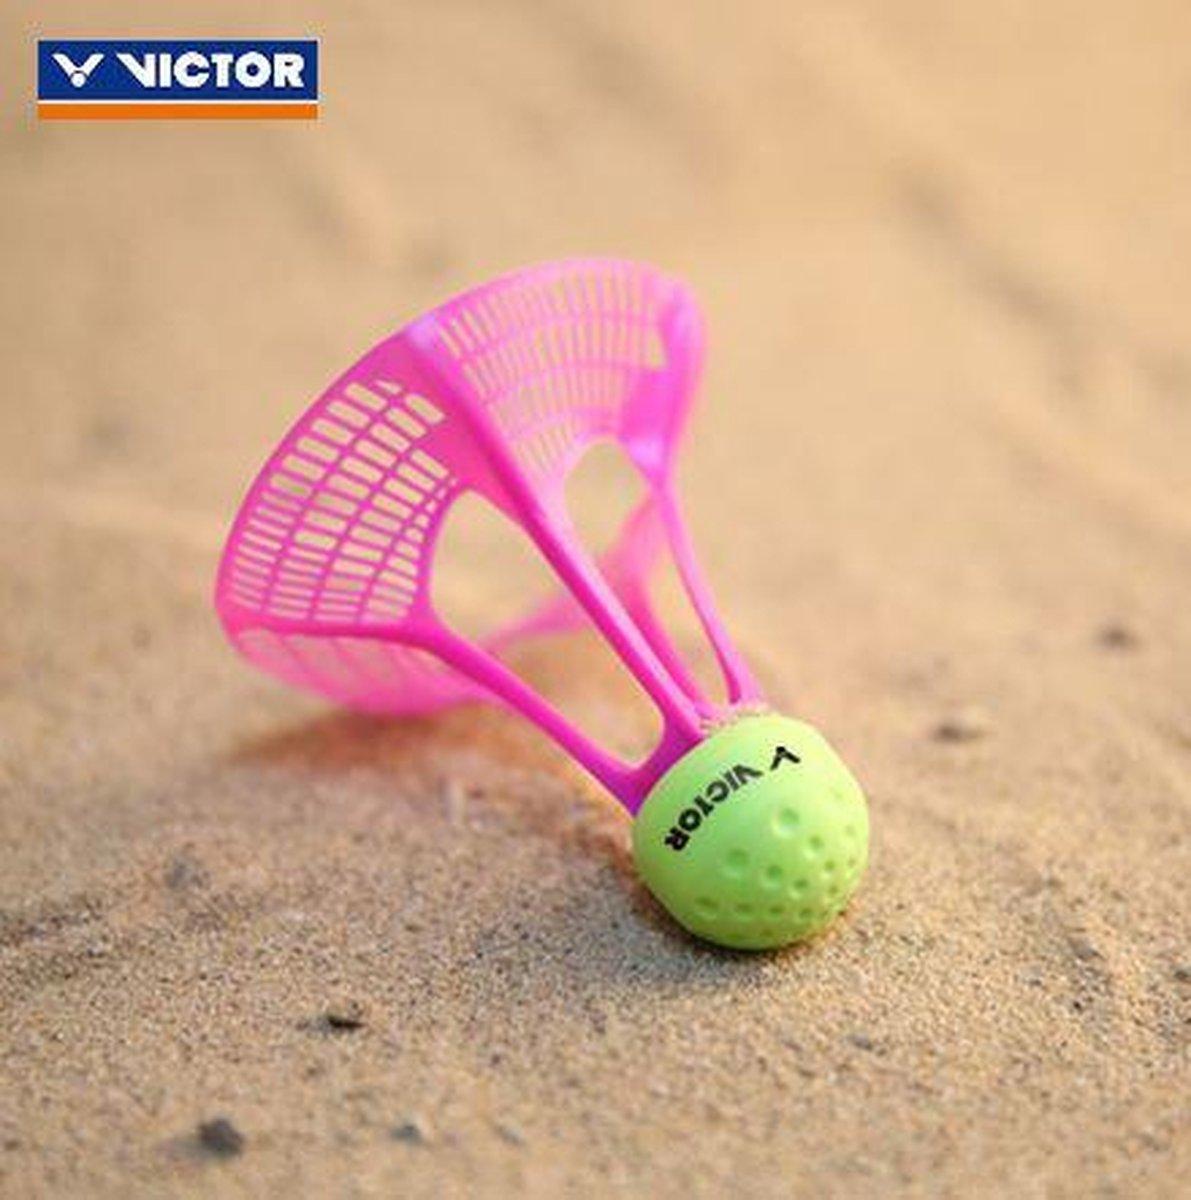 VICTOR shuttle voor Airbadminton | the new outdoor game